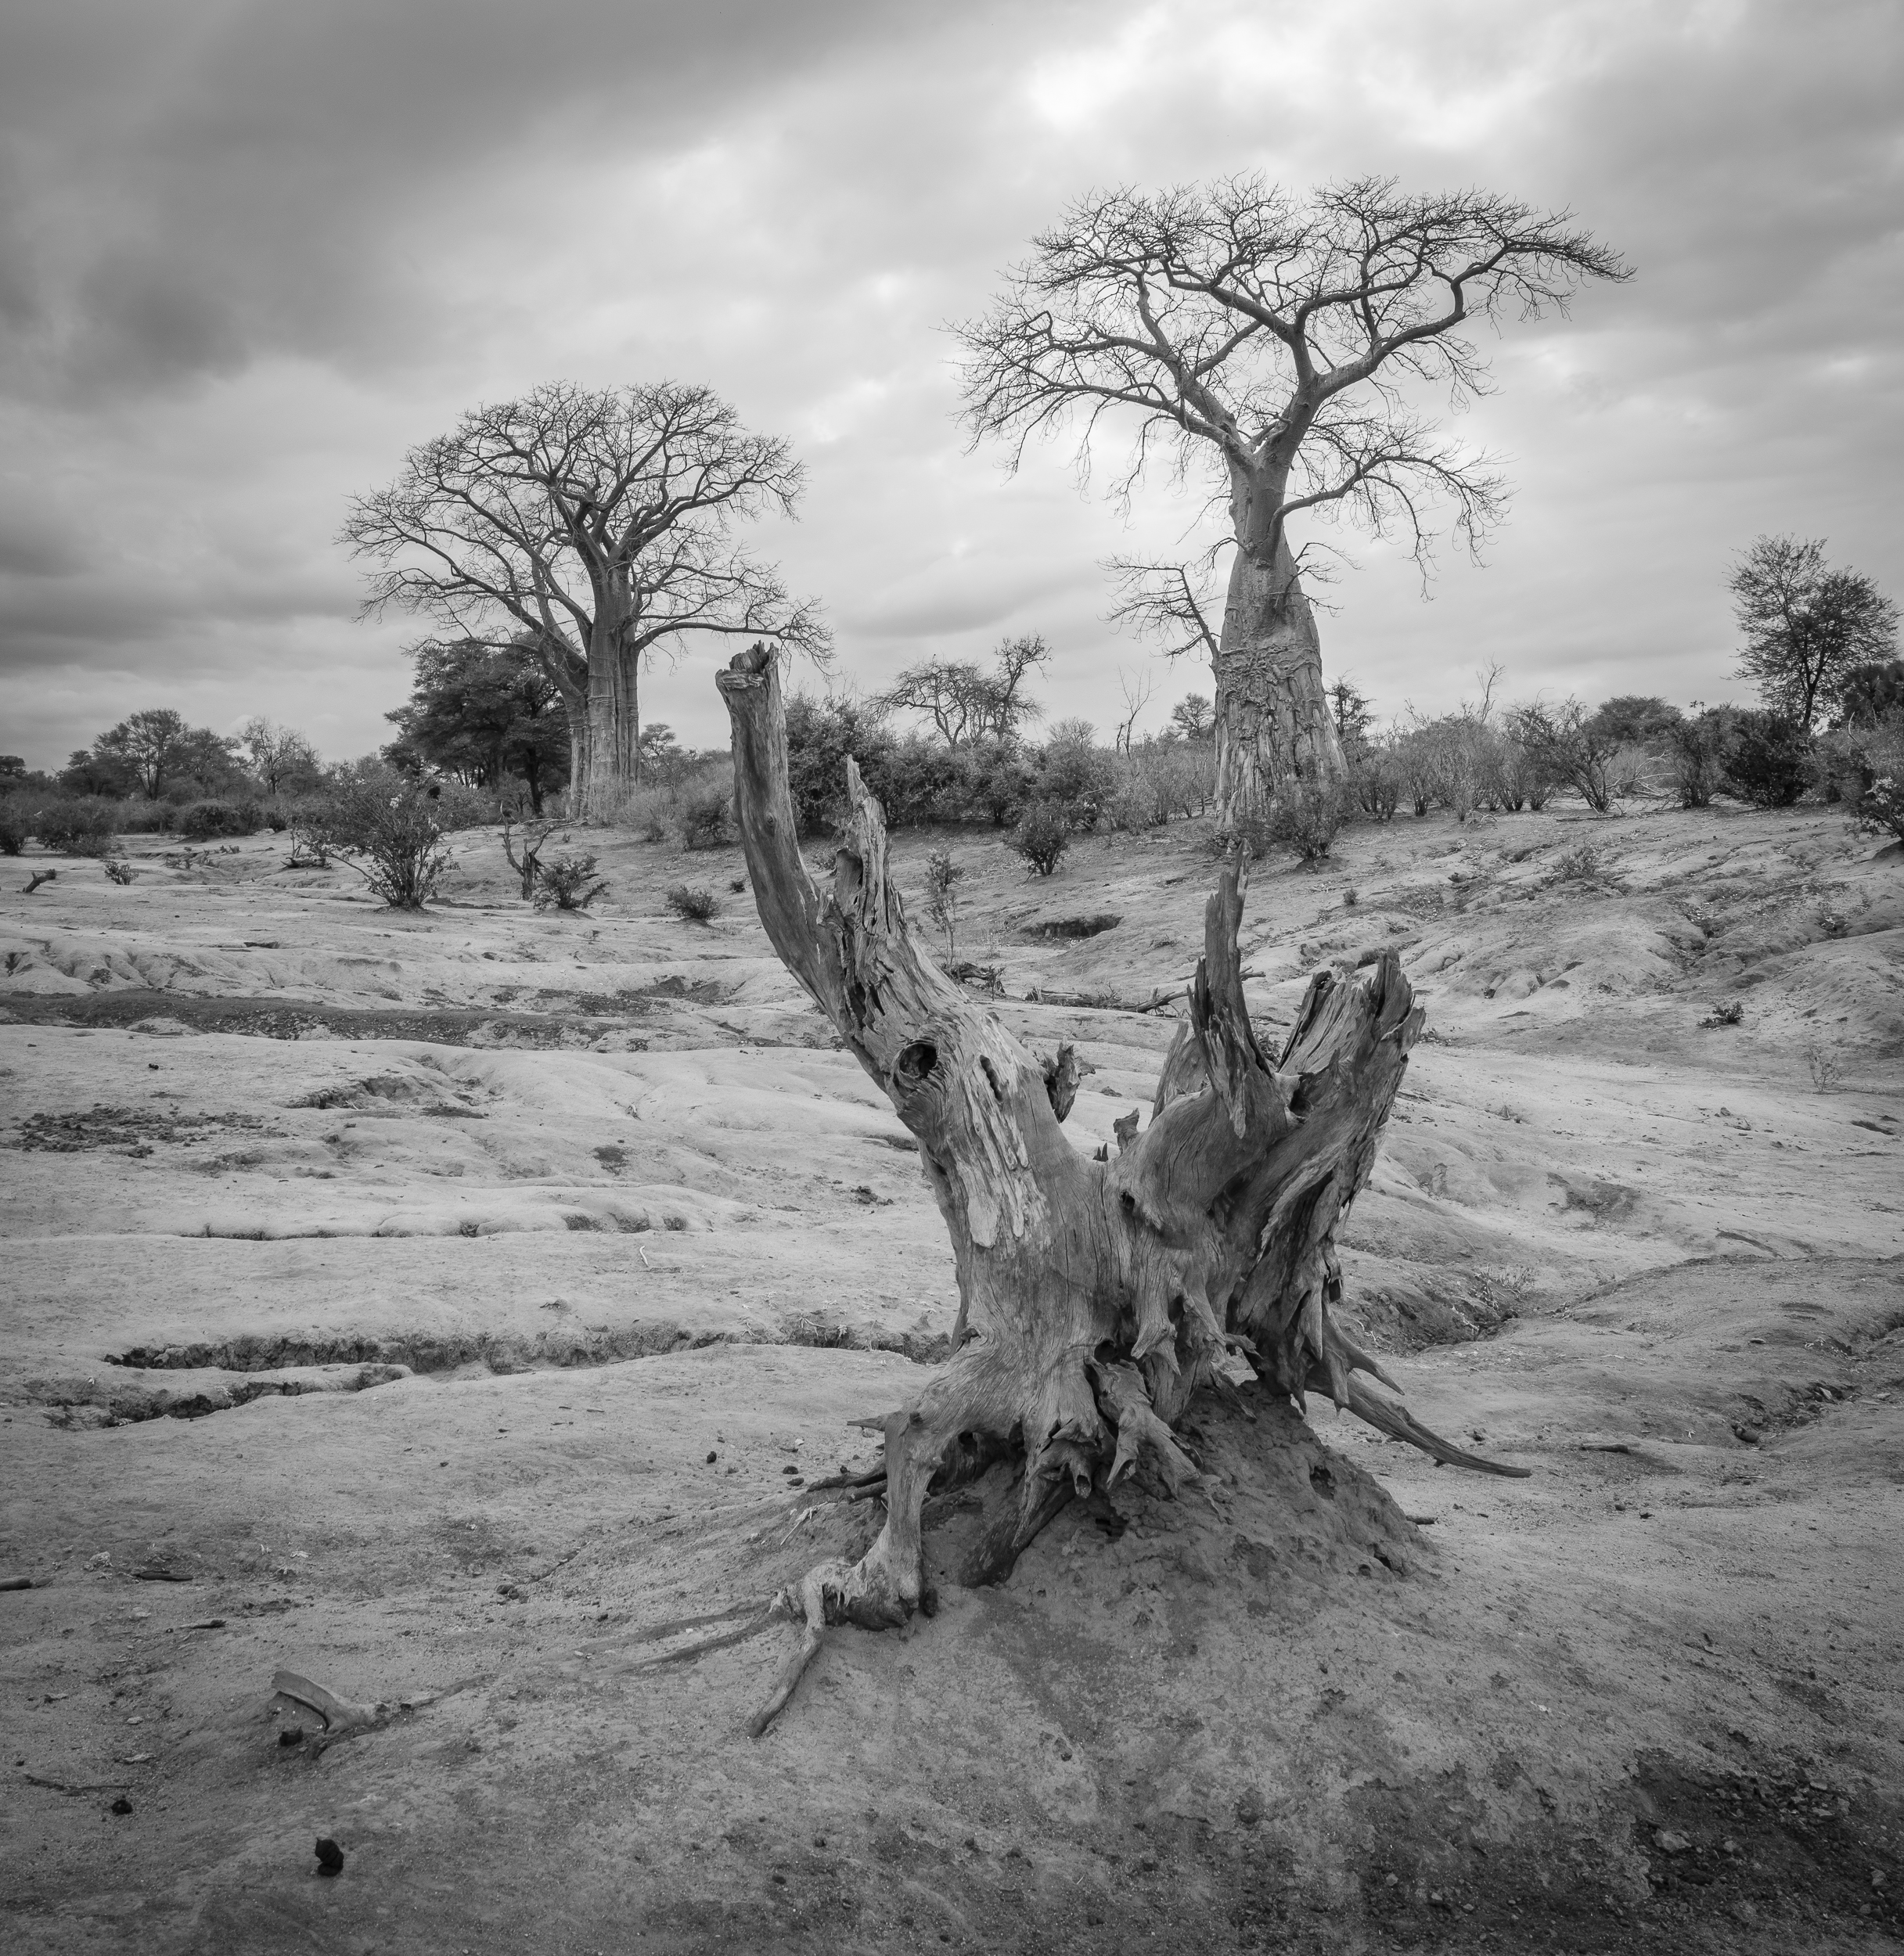 Zambia-2197.jpg